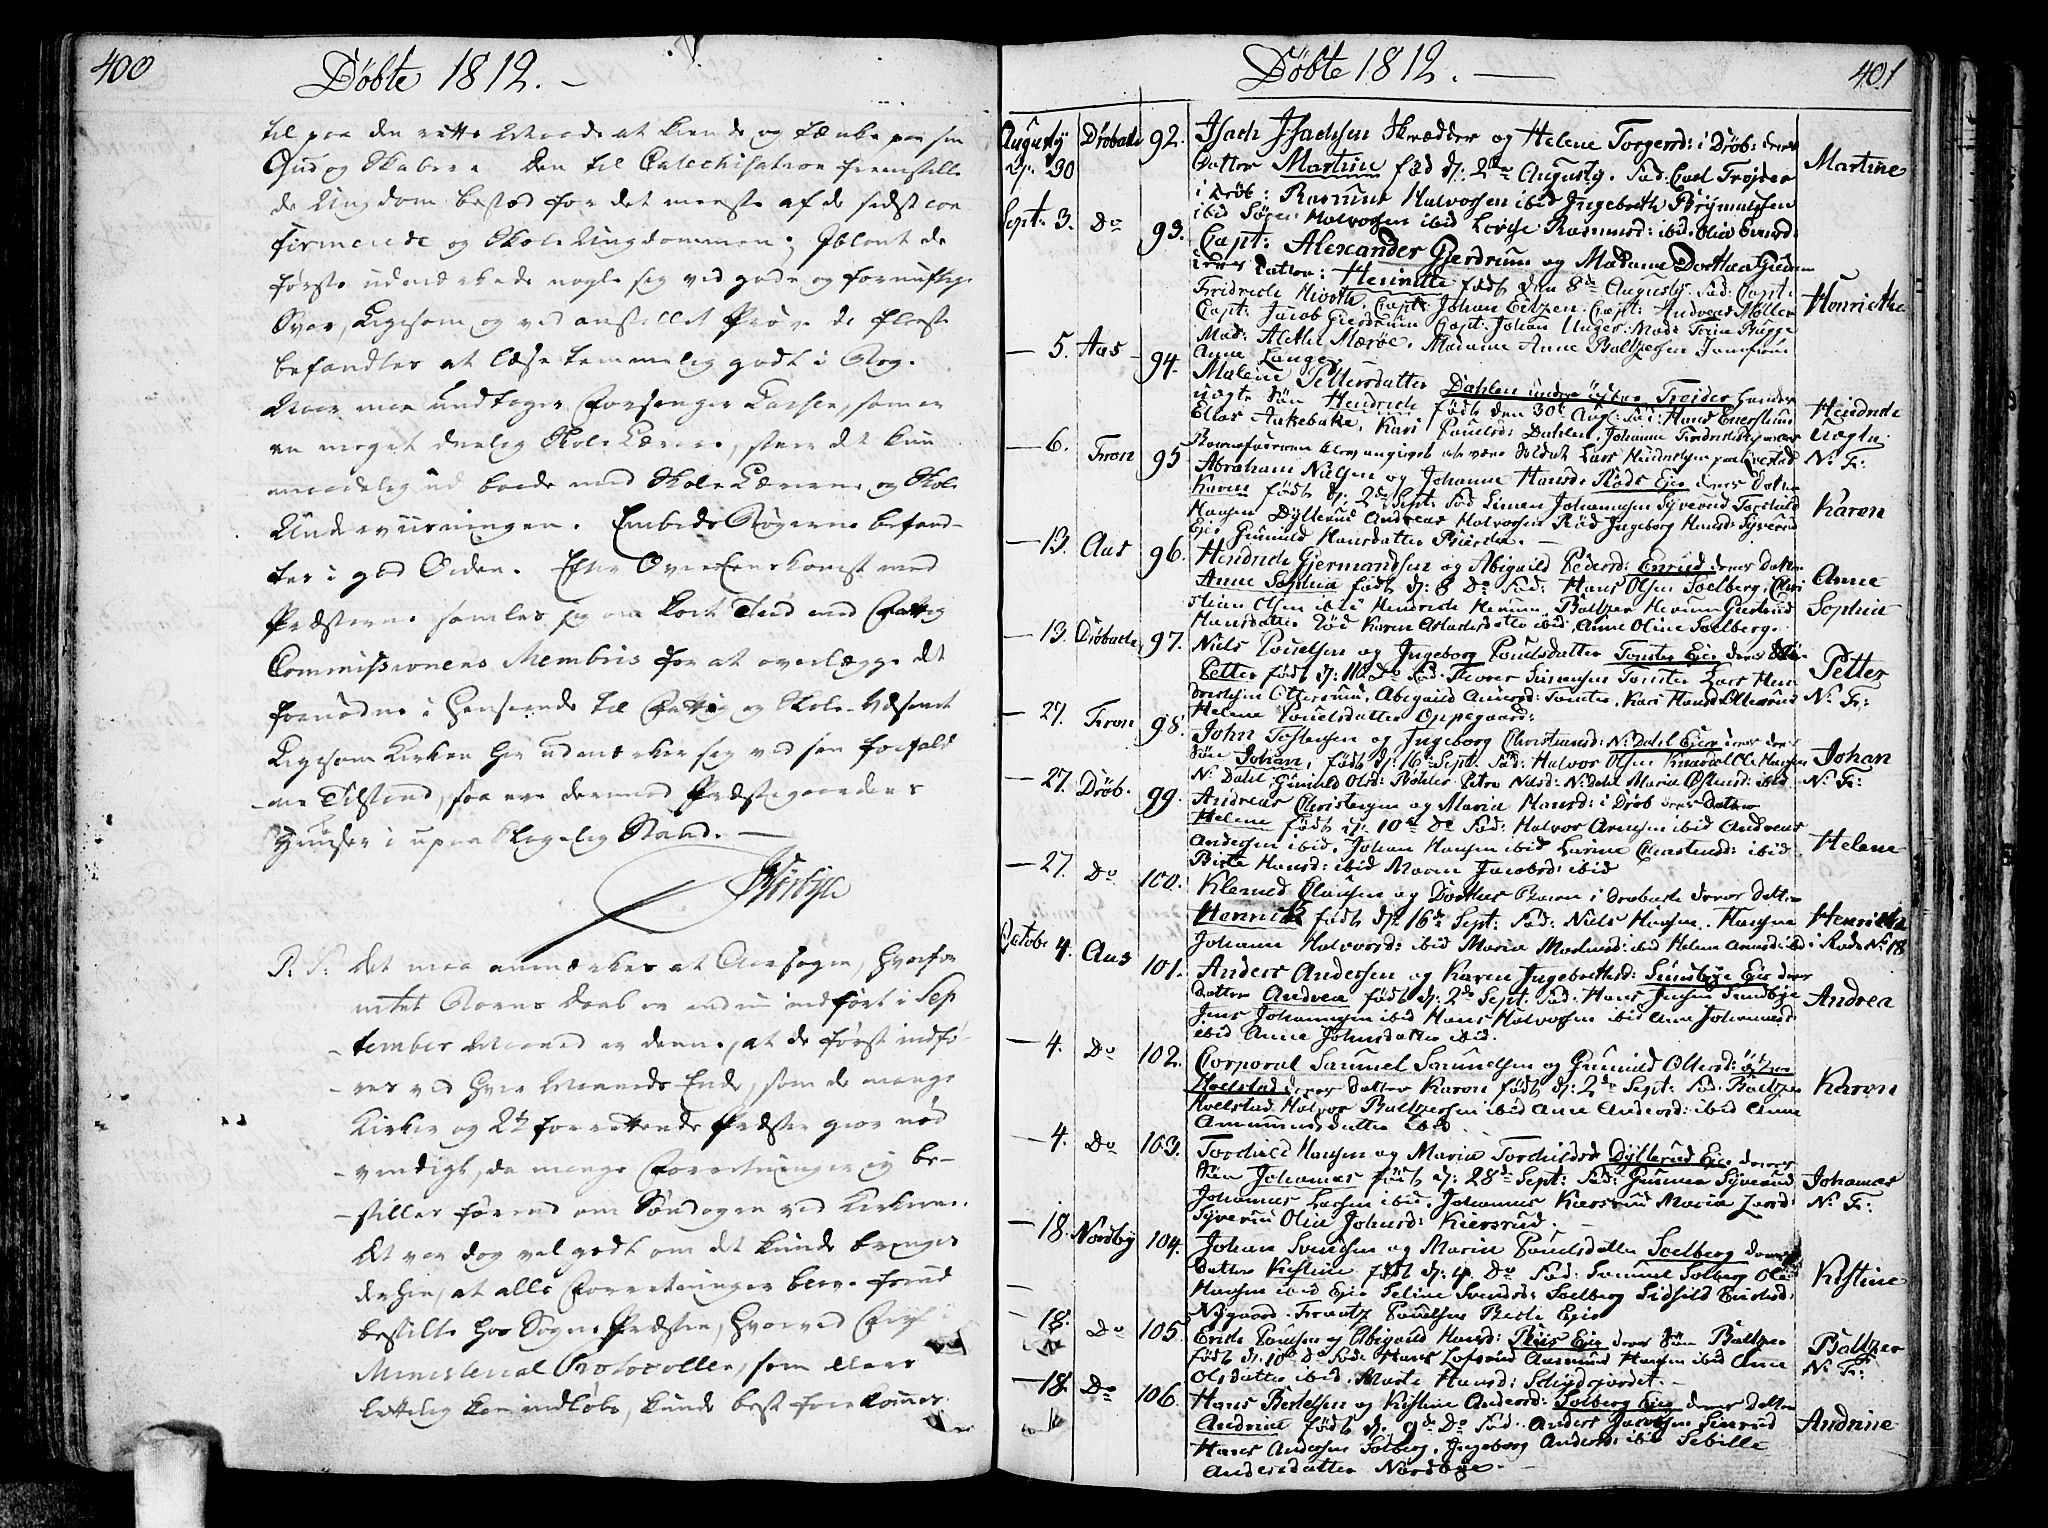 SAO, Ås prestekontor Kirkebøker, F/Fa/L0002: Ministerialbok nr. I 2, 1778-1813, s. 400-401